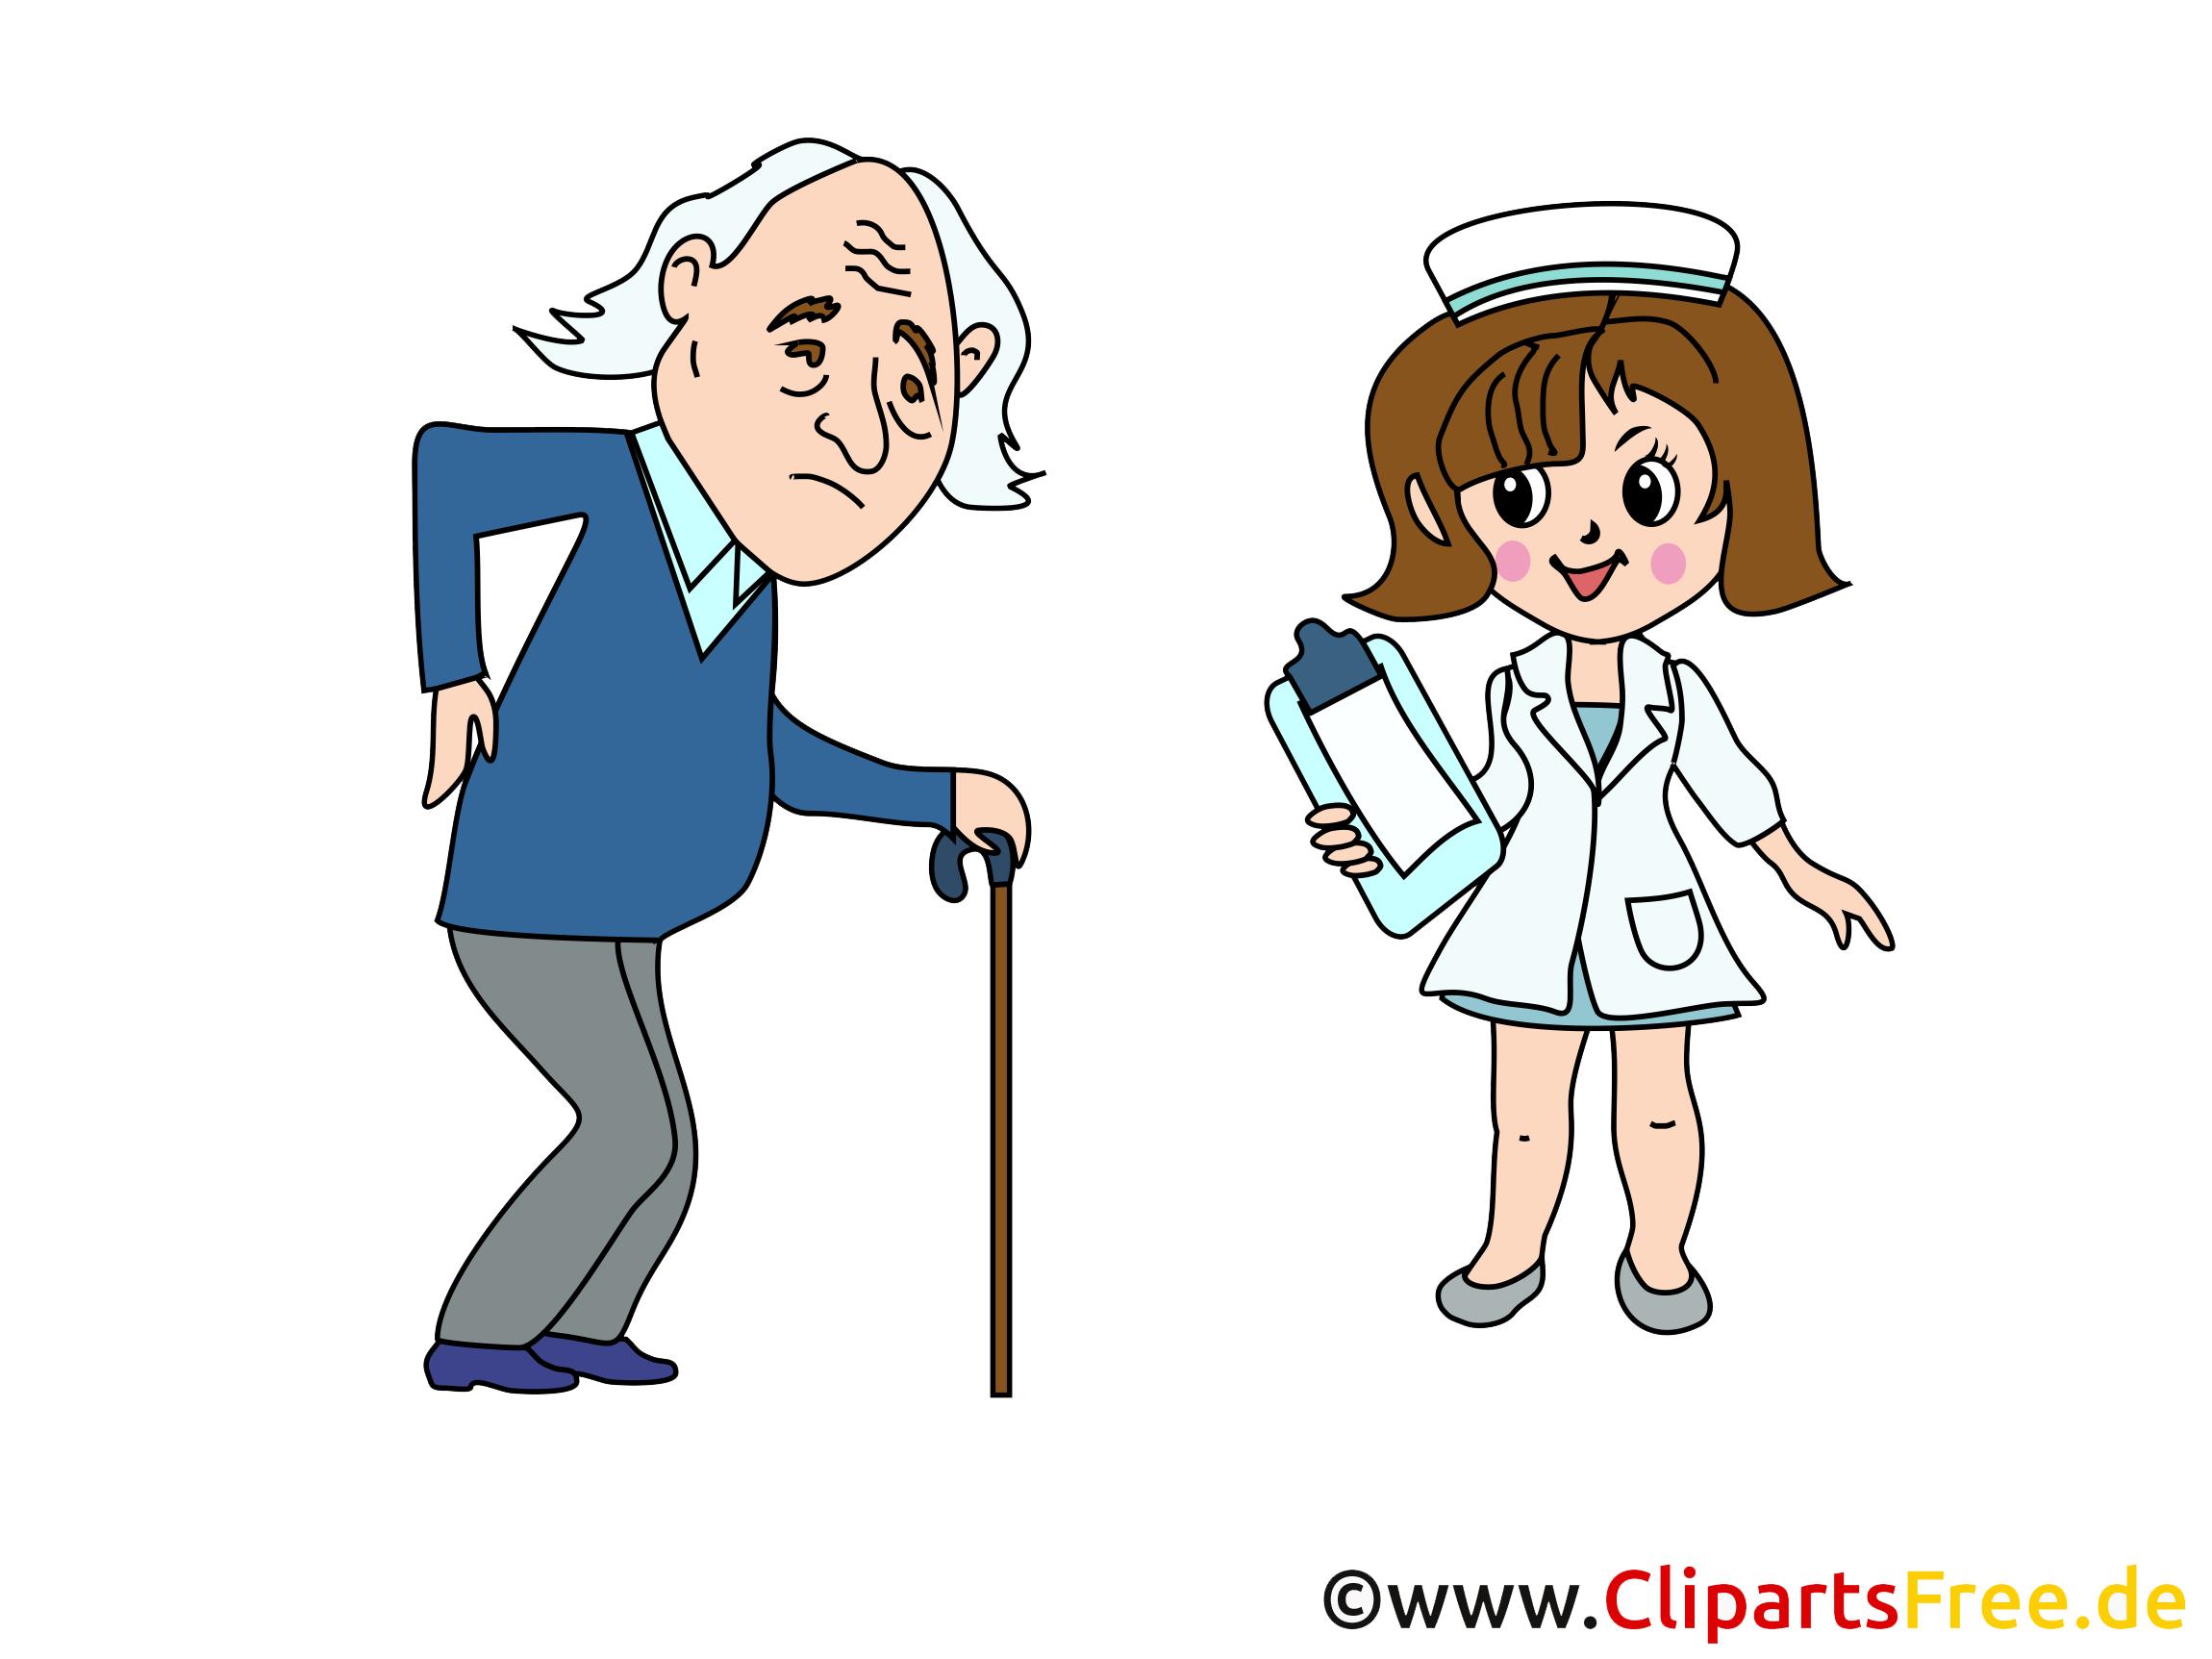 Krankenkasse Cartoon, Bild, Clipart